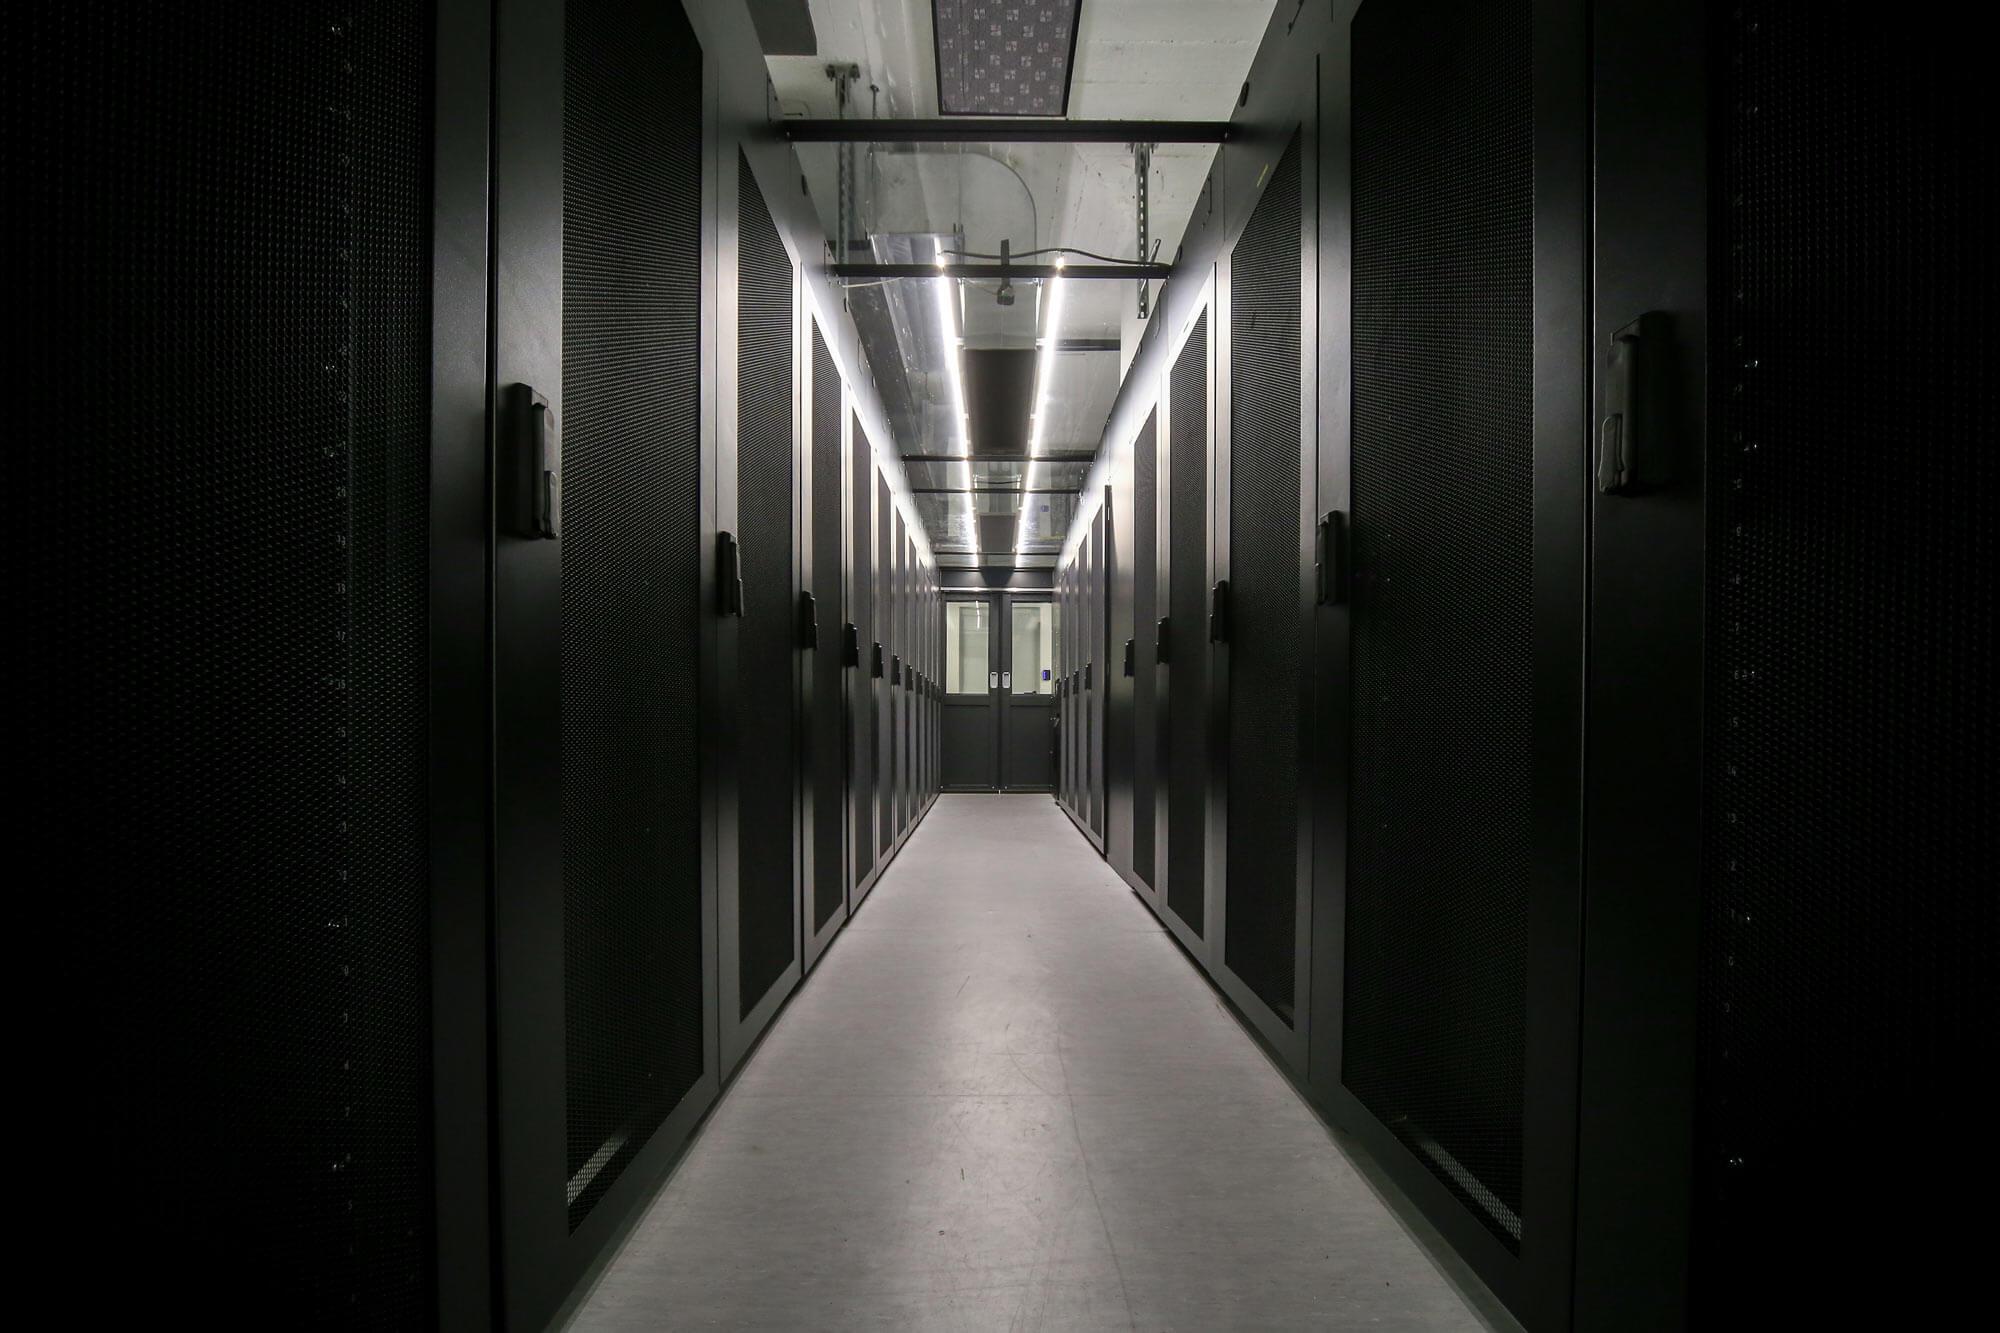 Hideg folyosó